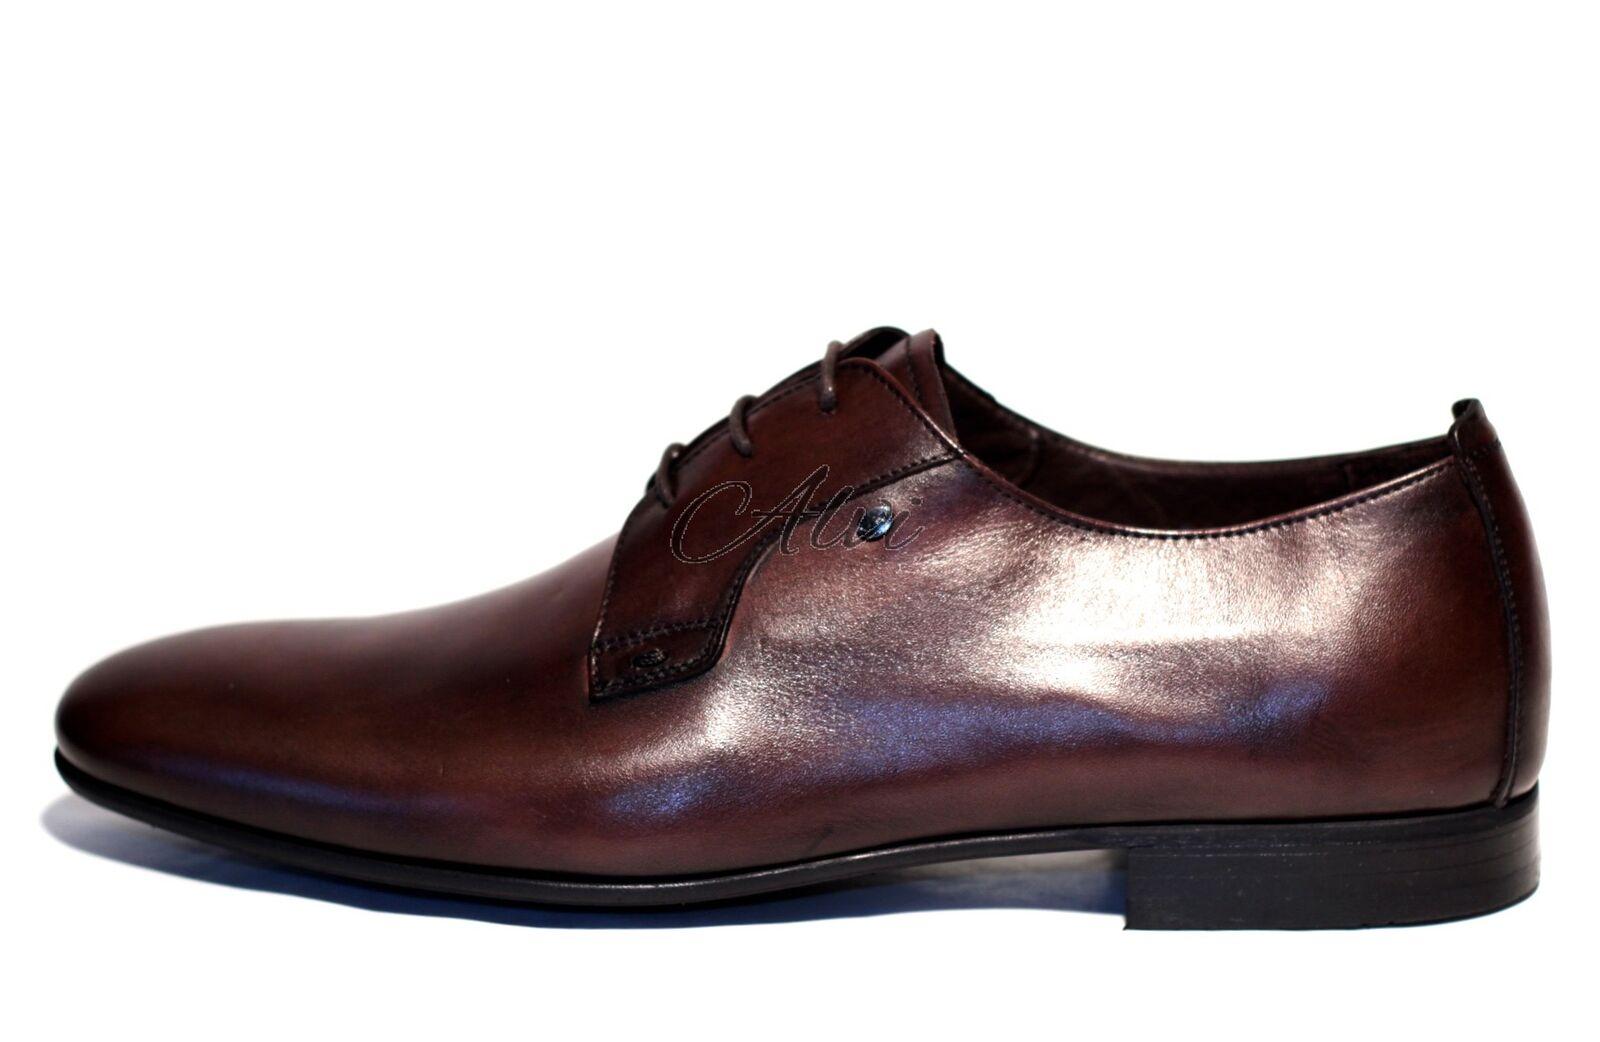 new style 1cc8e 0f611 scarpe uomo eleganti